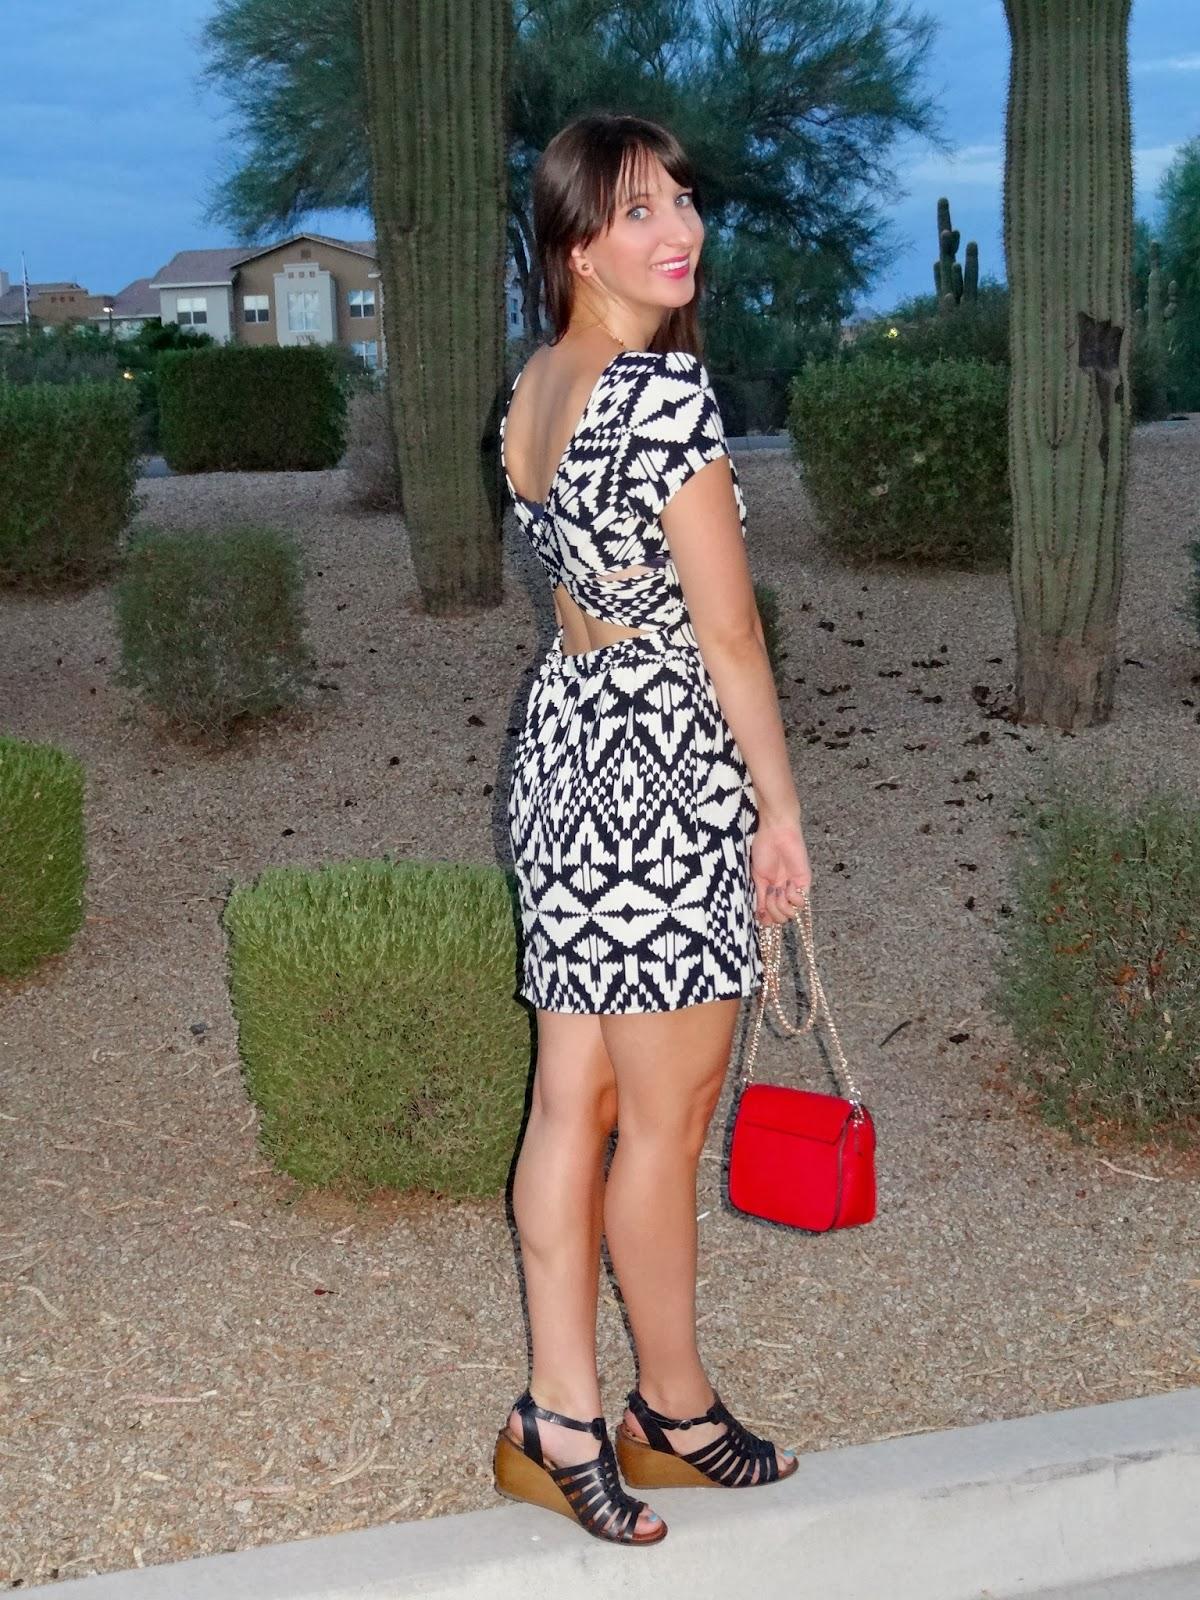 Black dress with red bag - Thursday October 17 2013